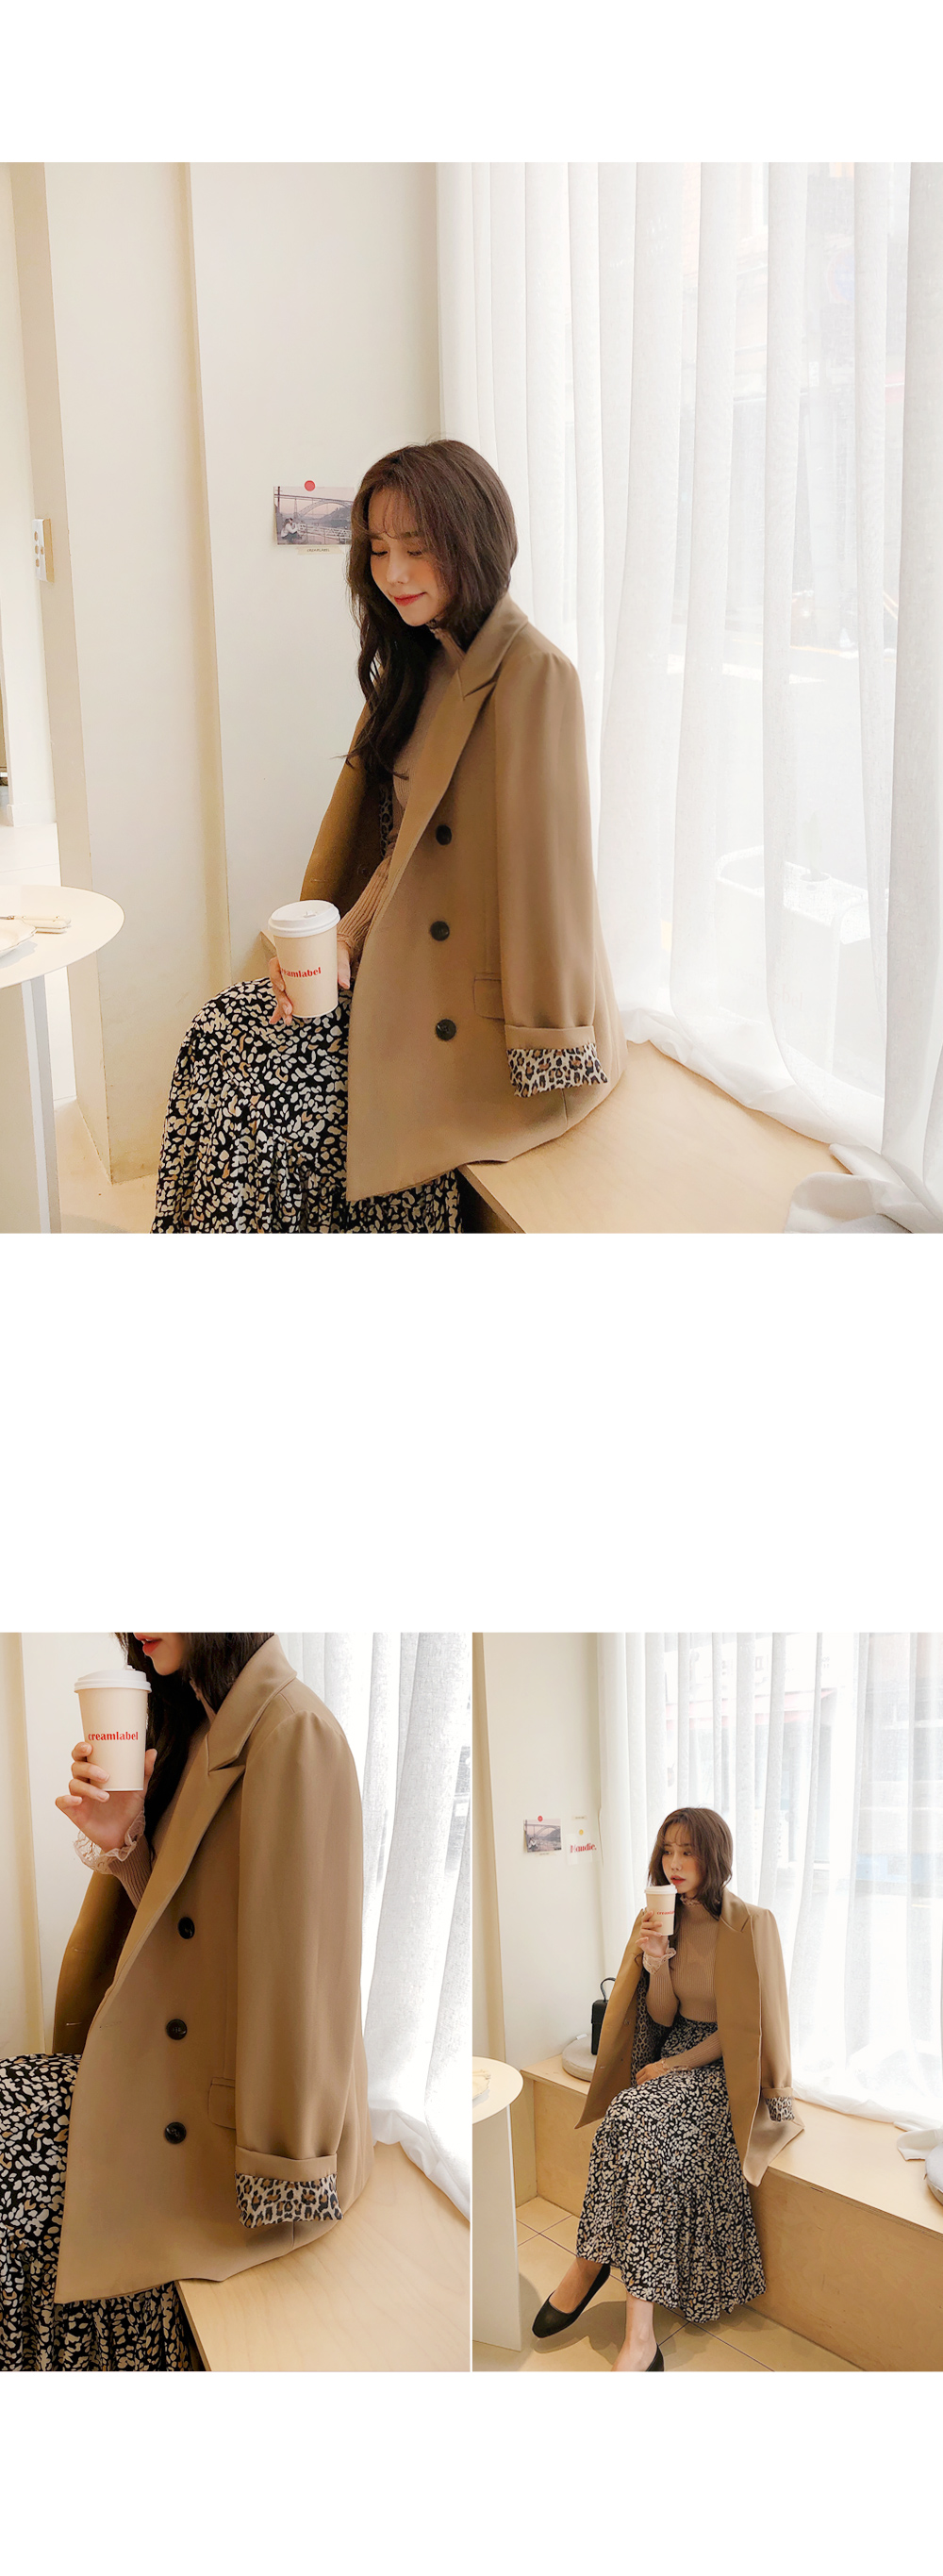 Stylish Leopard Point Jacket